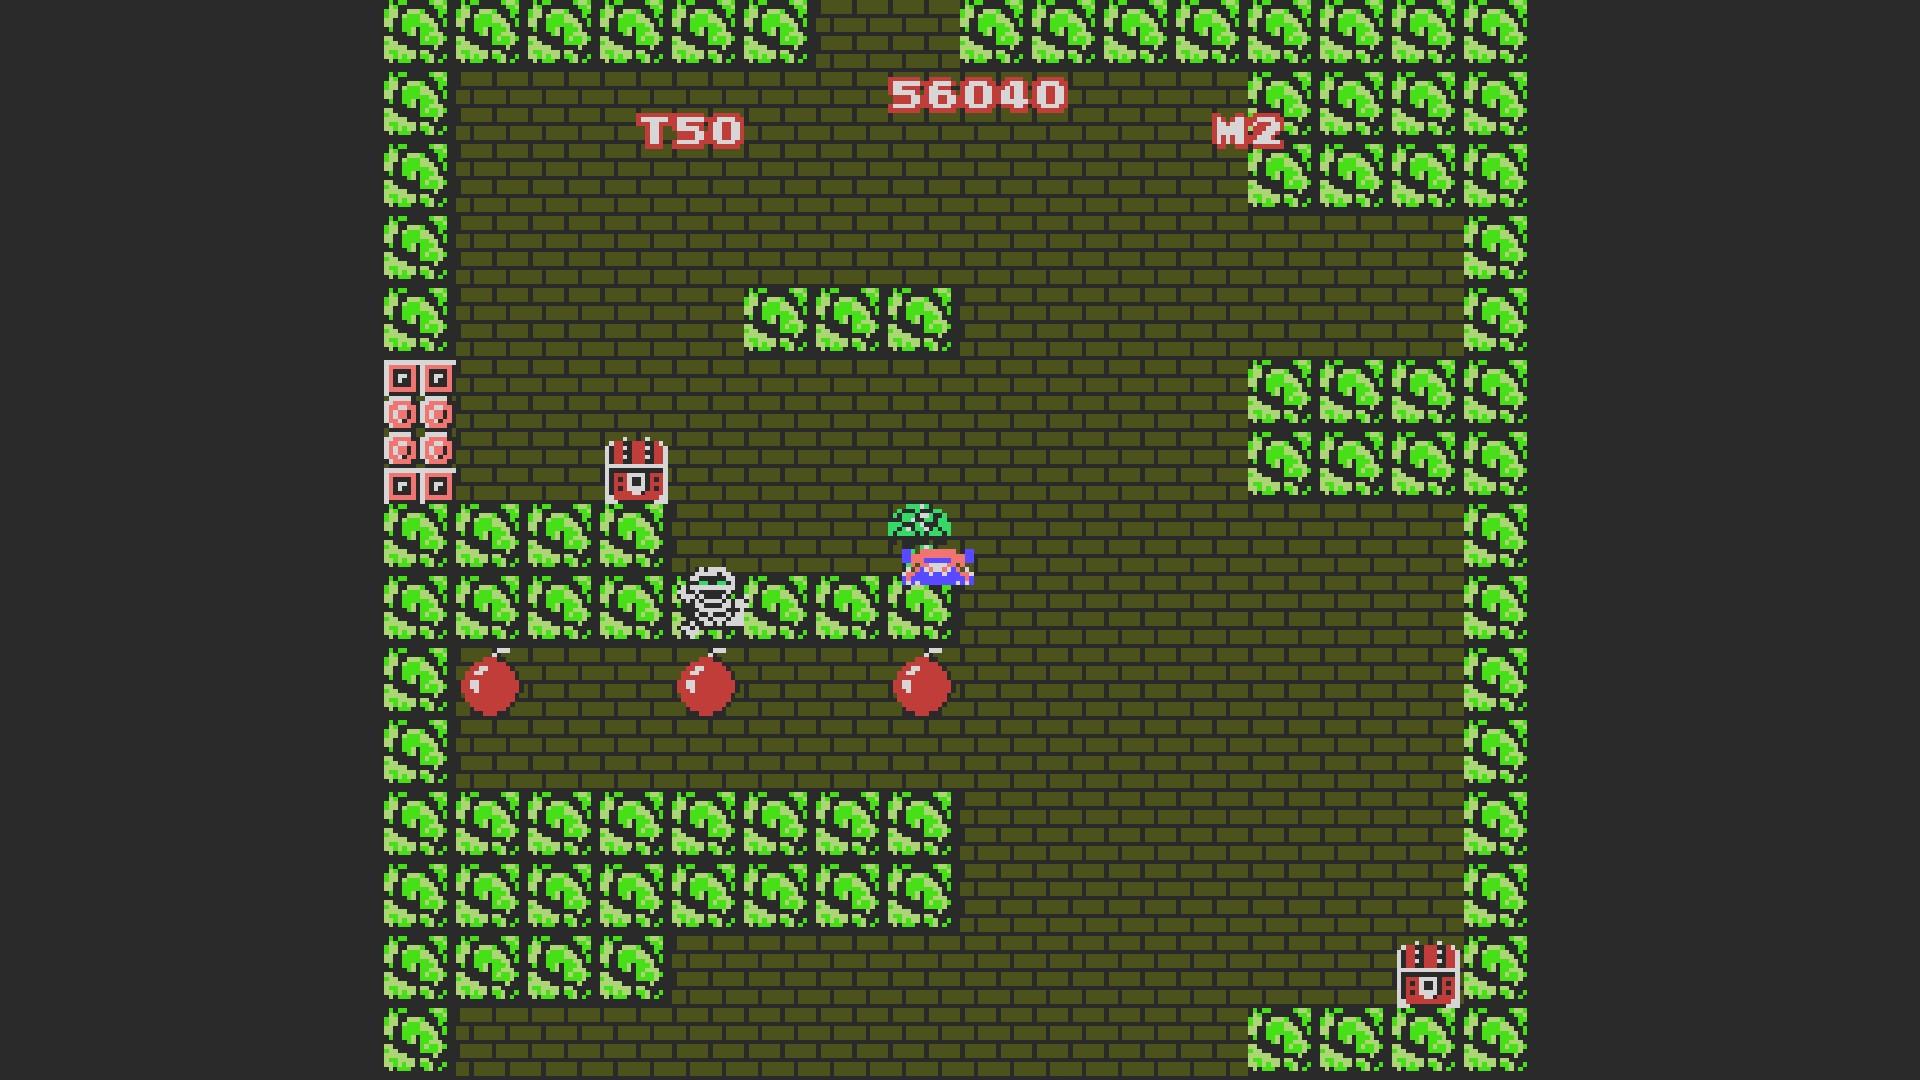 AkinNahtanoj: Mighty Bomb Jack (NES/Famicom Emulated) 56,040 points on 2020-08-25 06:58:50